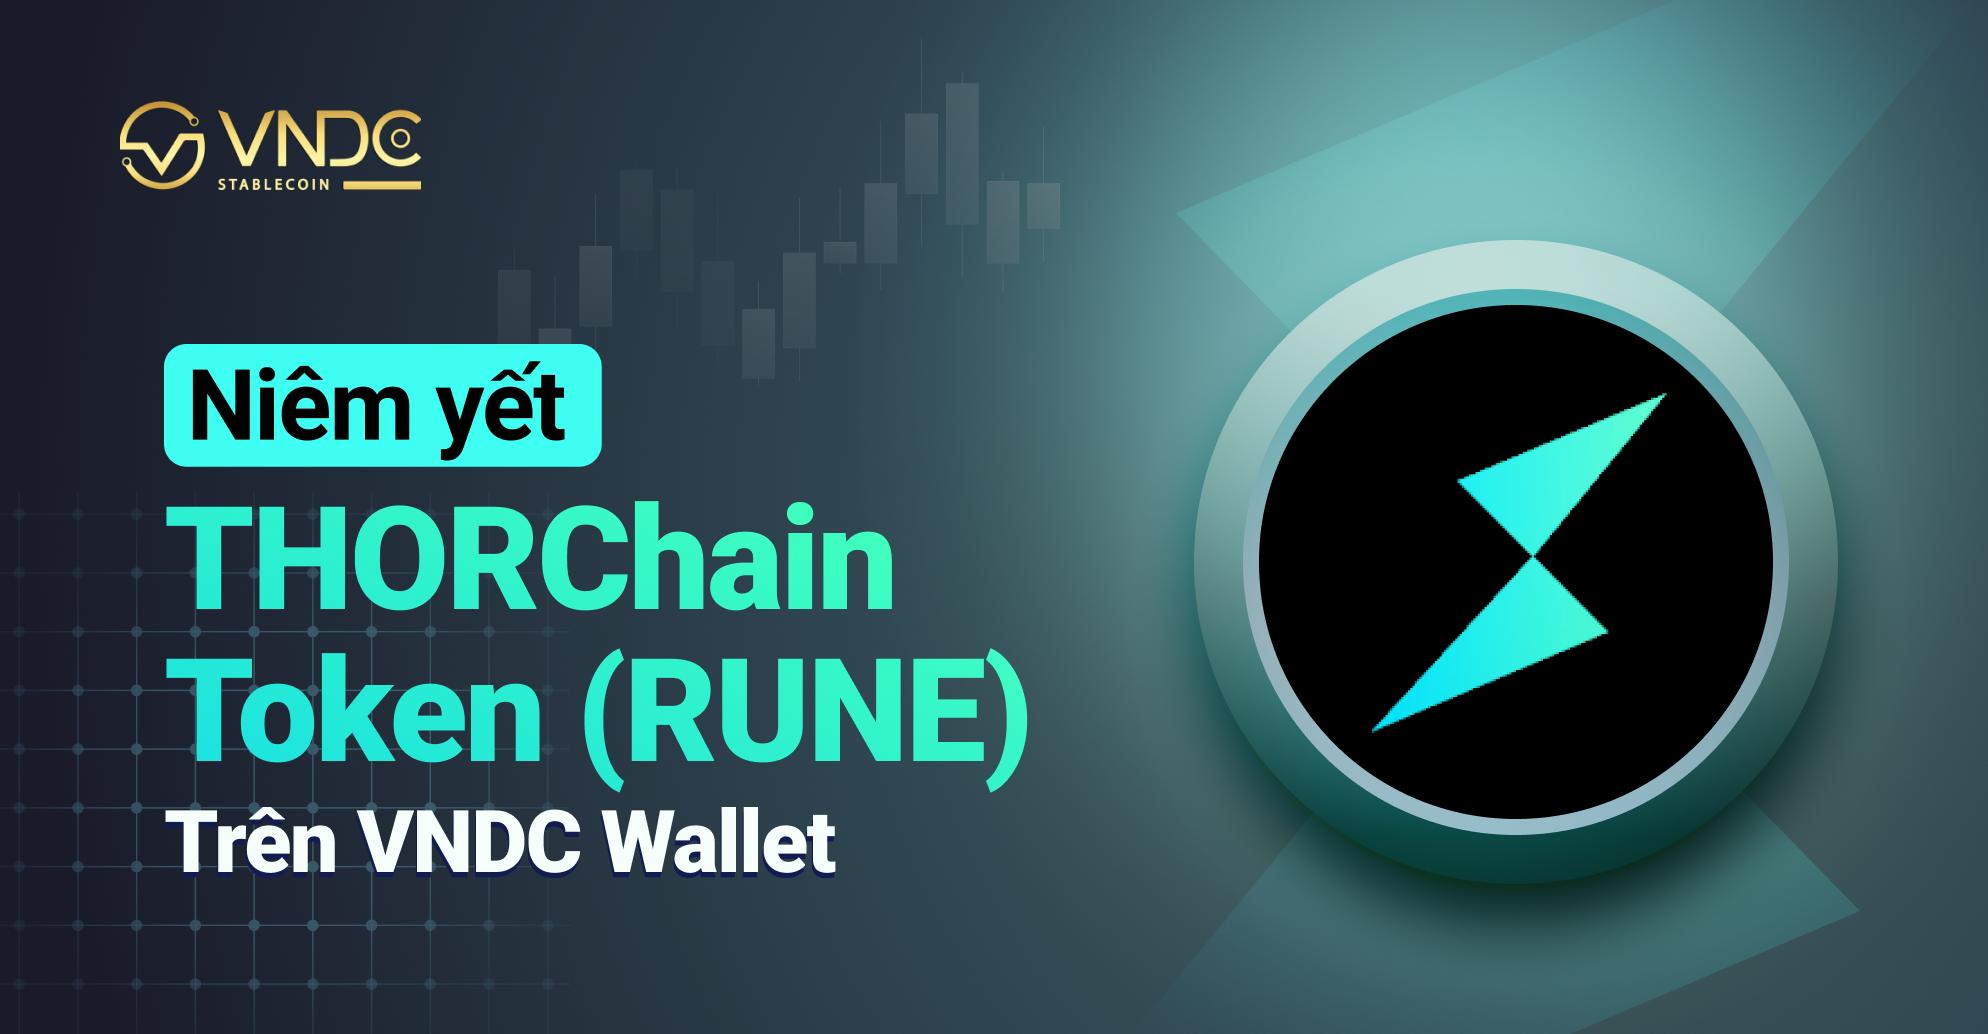 Niêm yết THORChain Token (RUNE) trên VNDC Wallet